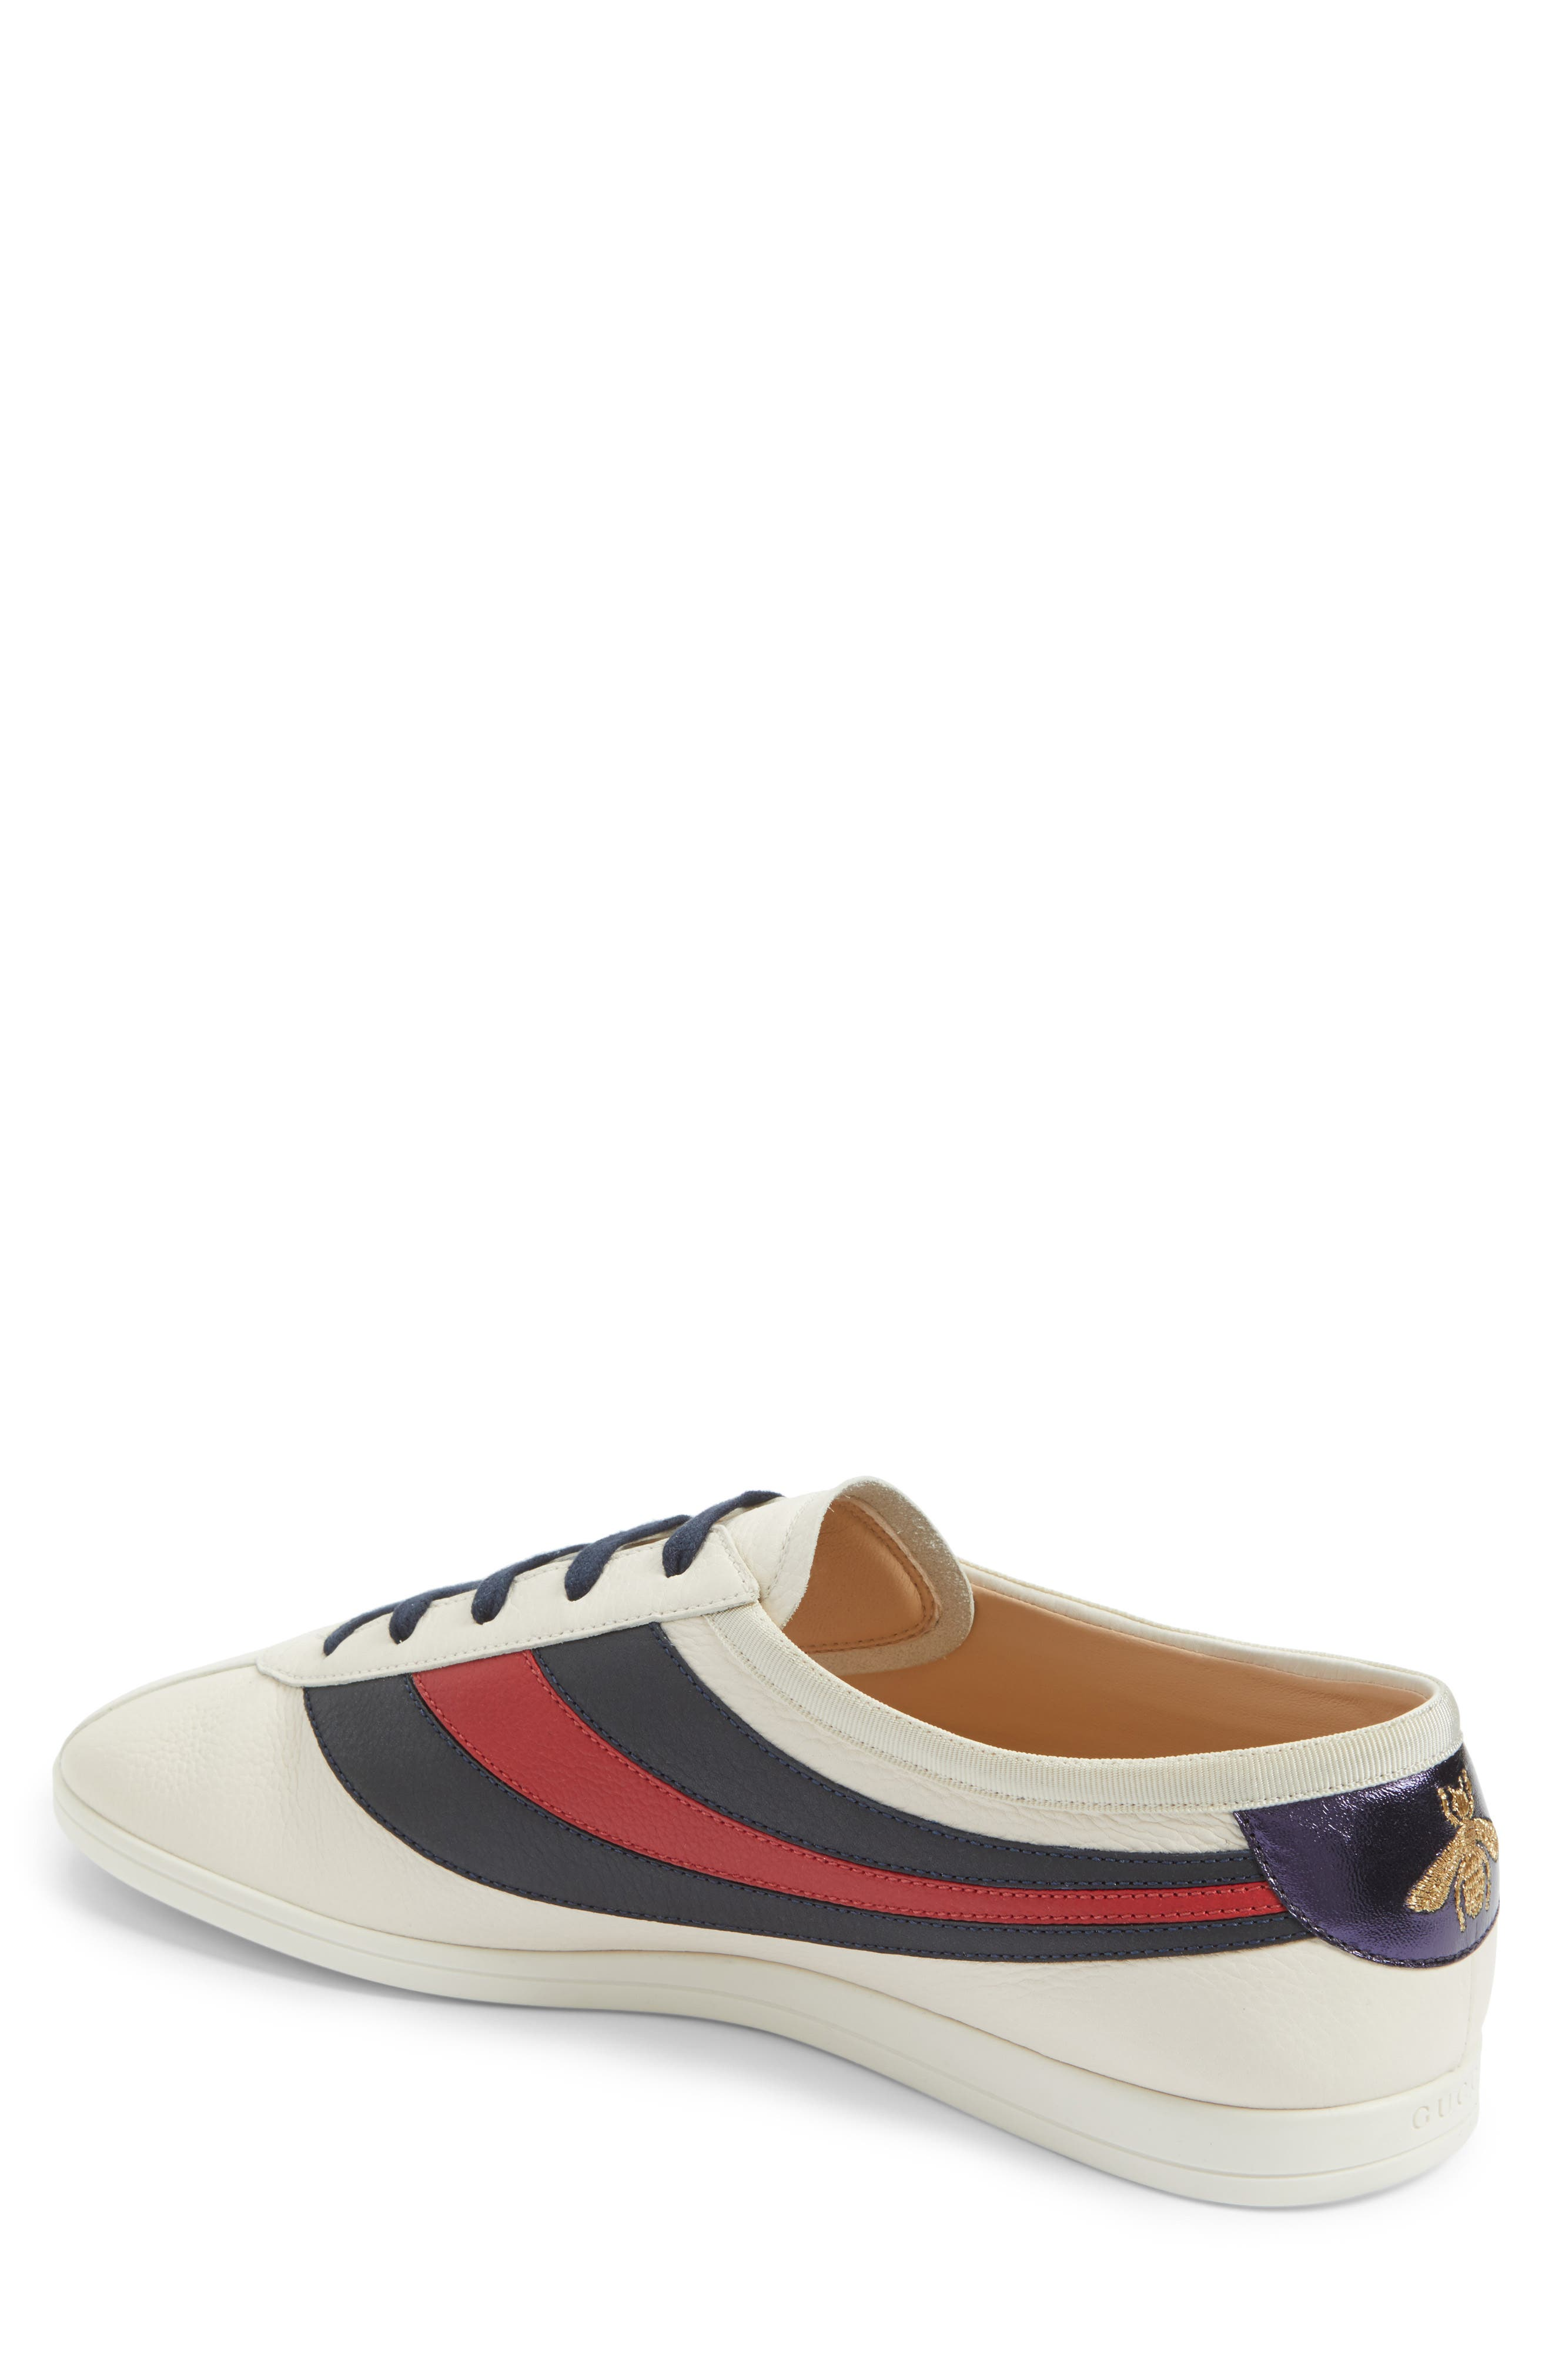 Alternate Image 2  - Gucci Falacer Sneaker (Men)